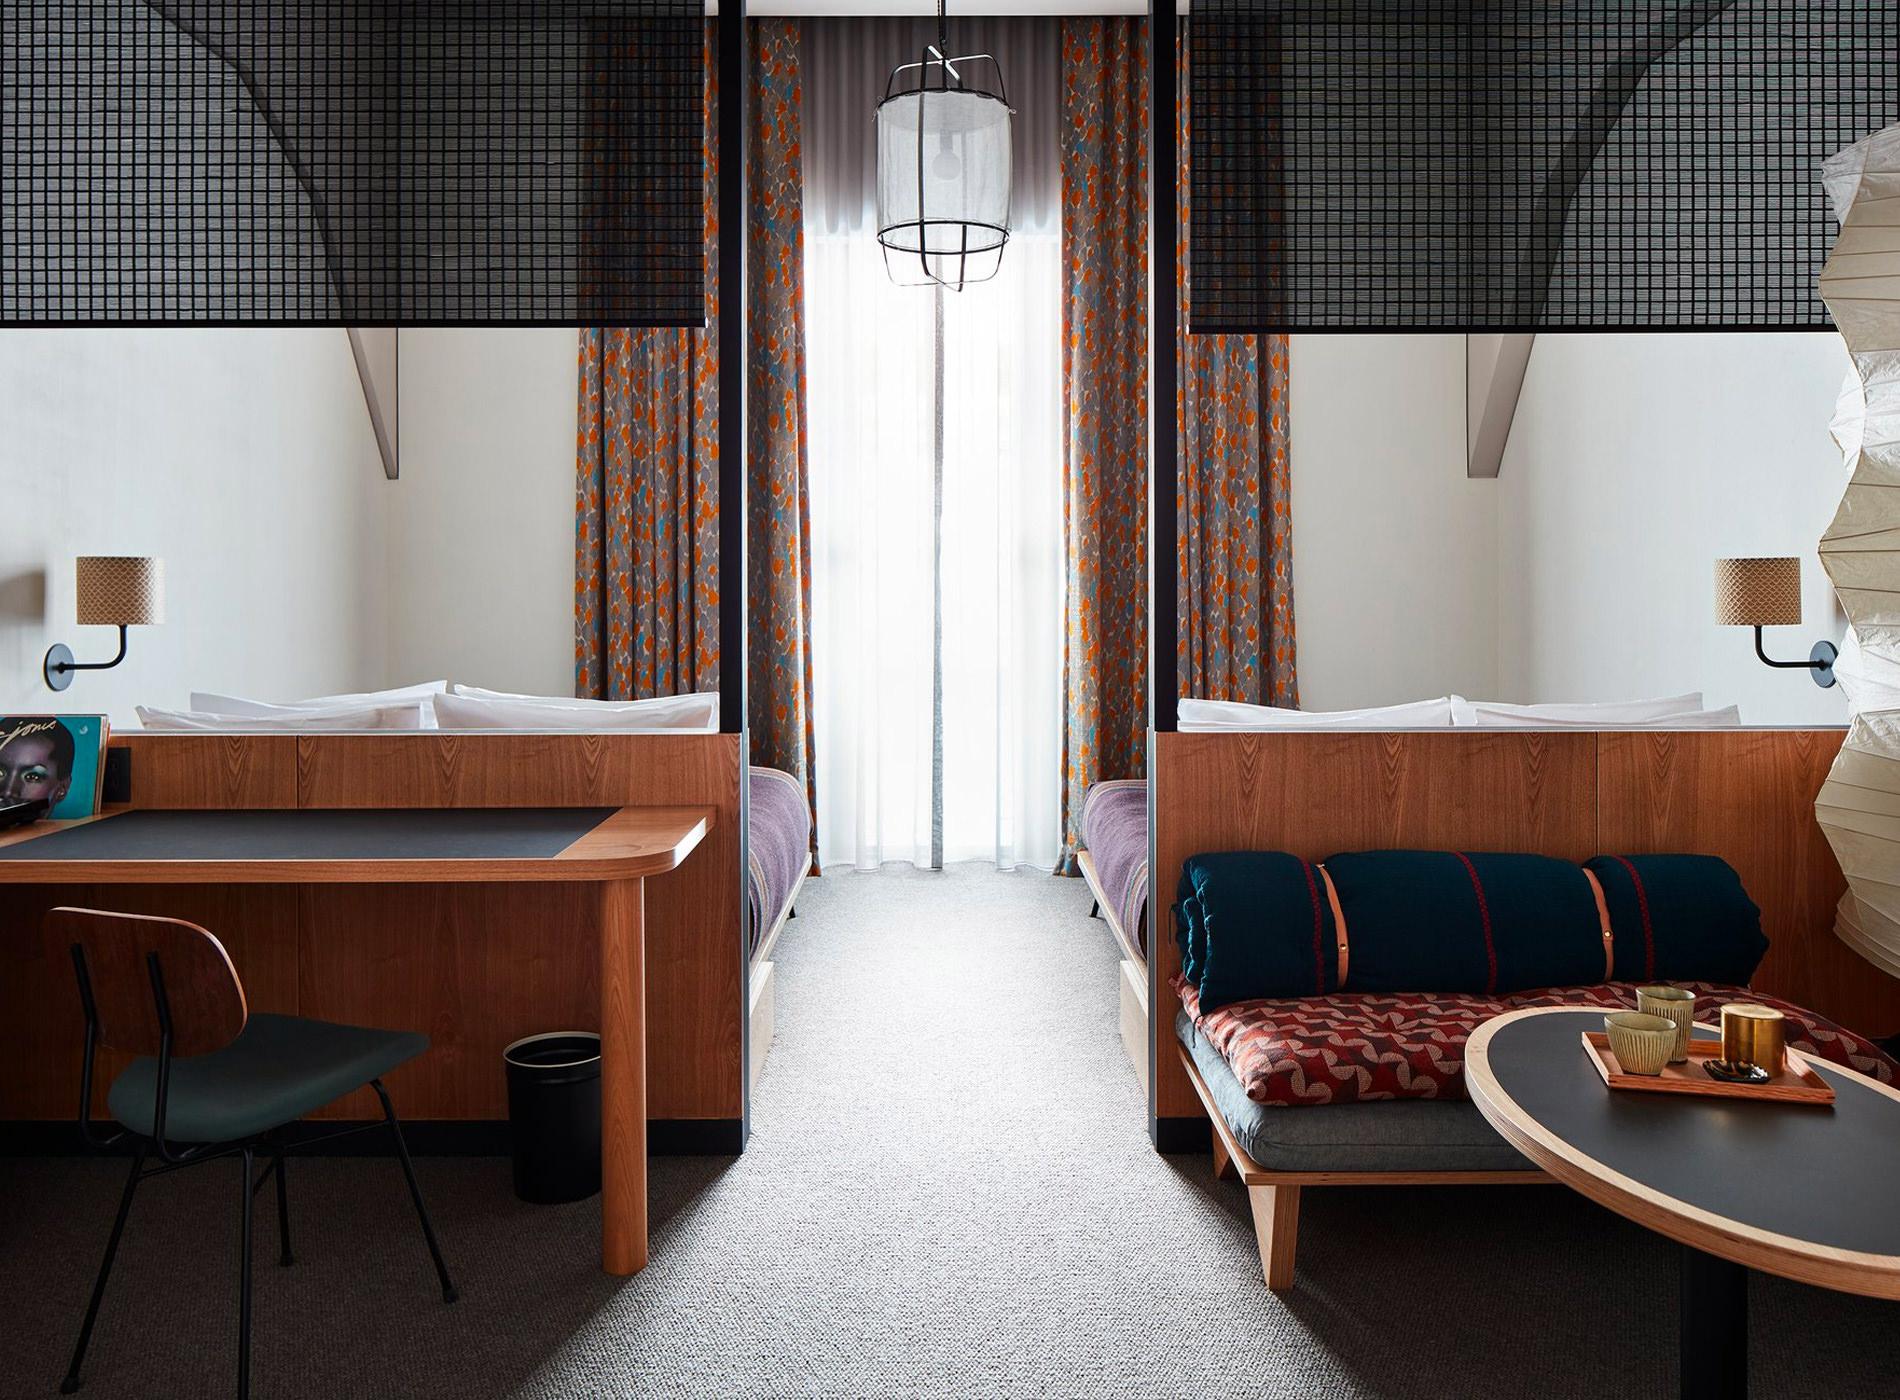 City Guide Kyoto. Ace Hotel Kyoto, Nakagyo (Kengo Kuma, Design Studio Commune)